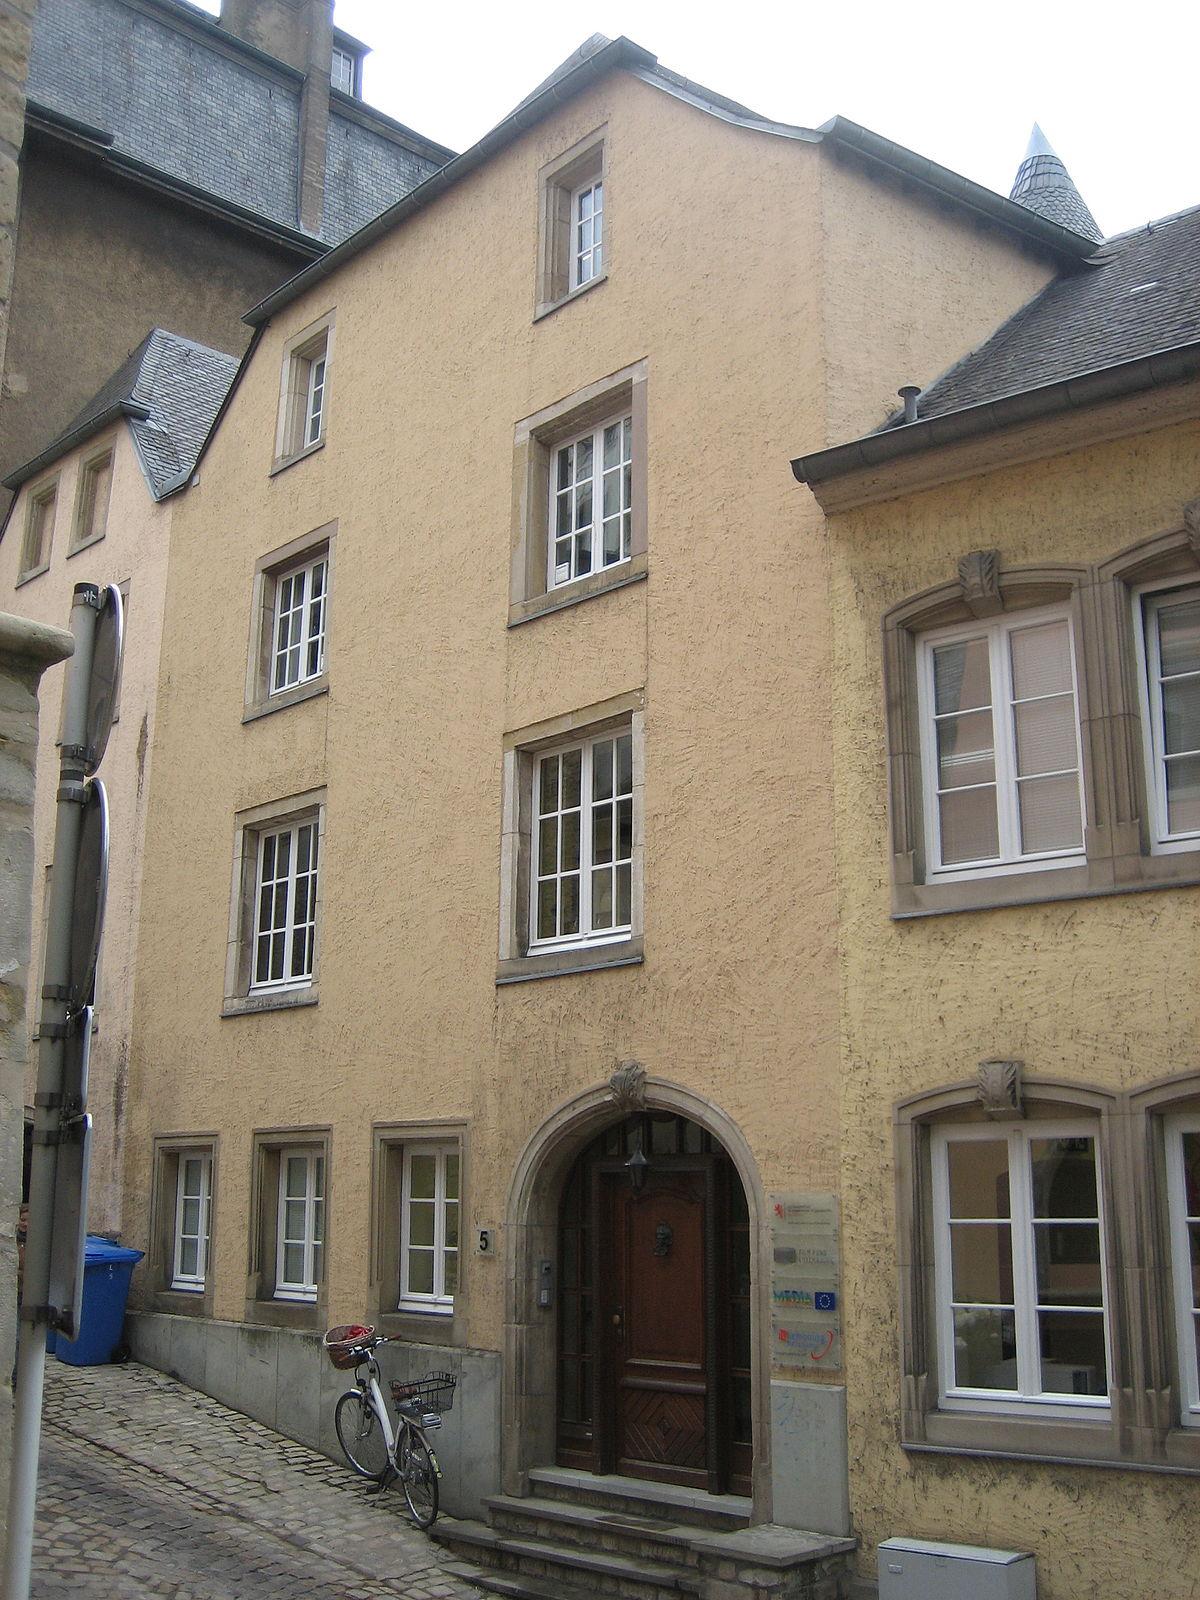 Nicolas de cassal wikipedia for Maison moderne luxembourg wikipedia